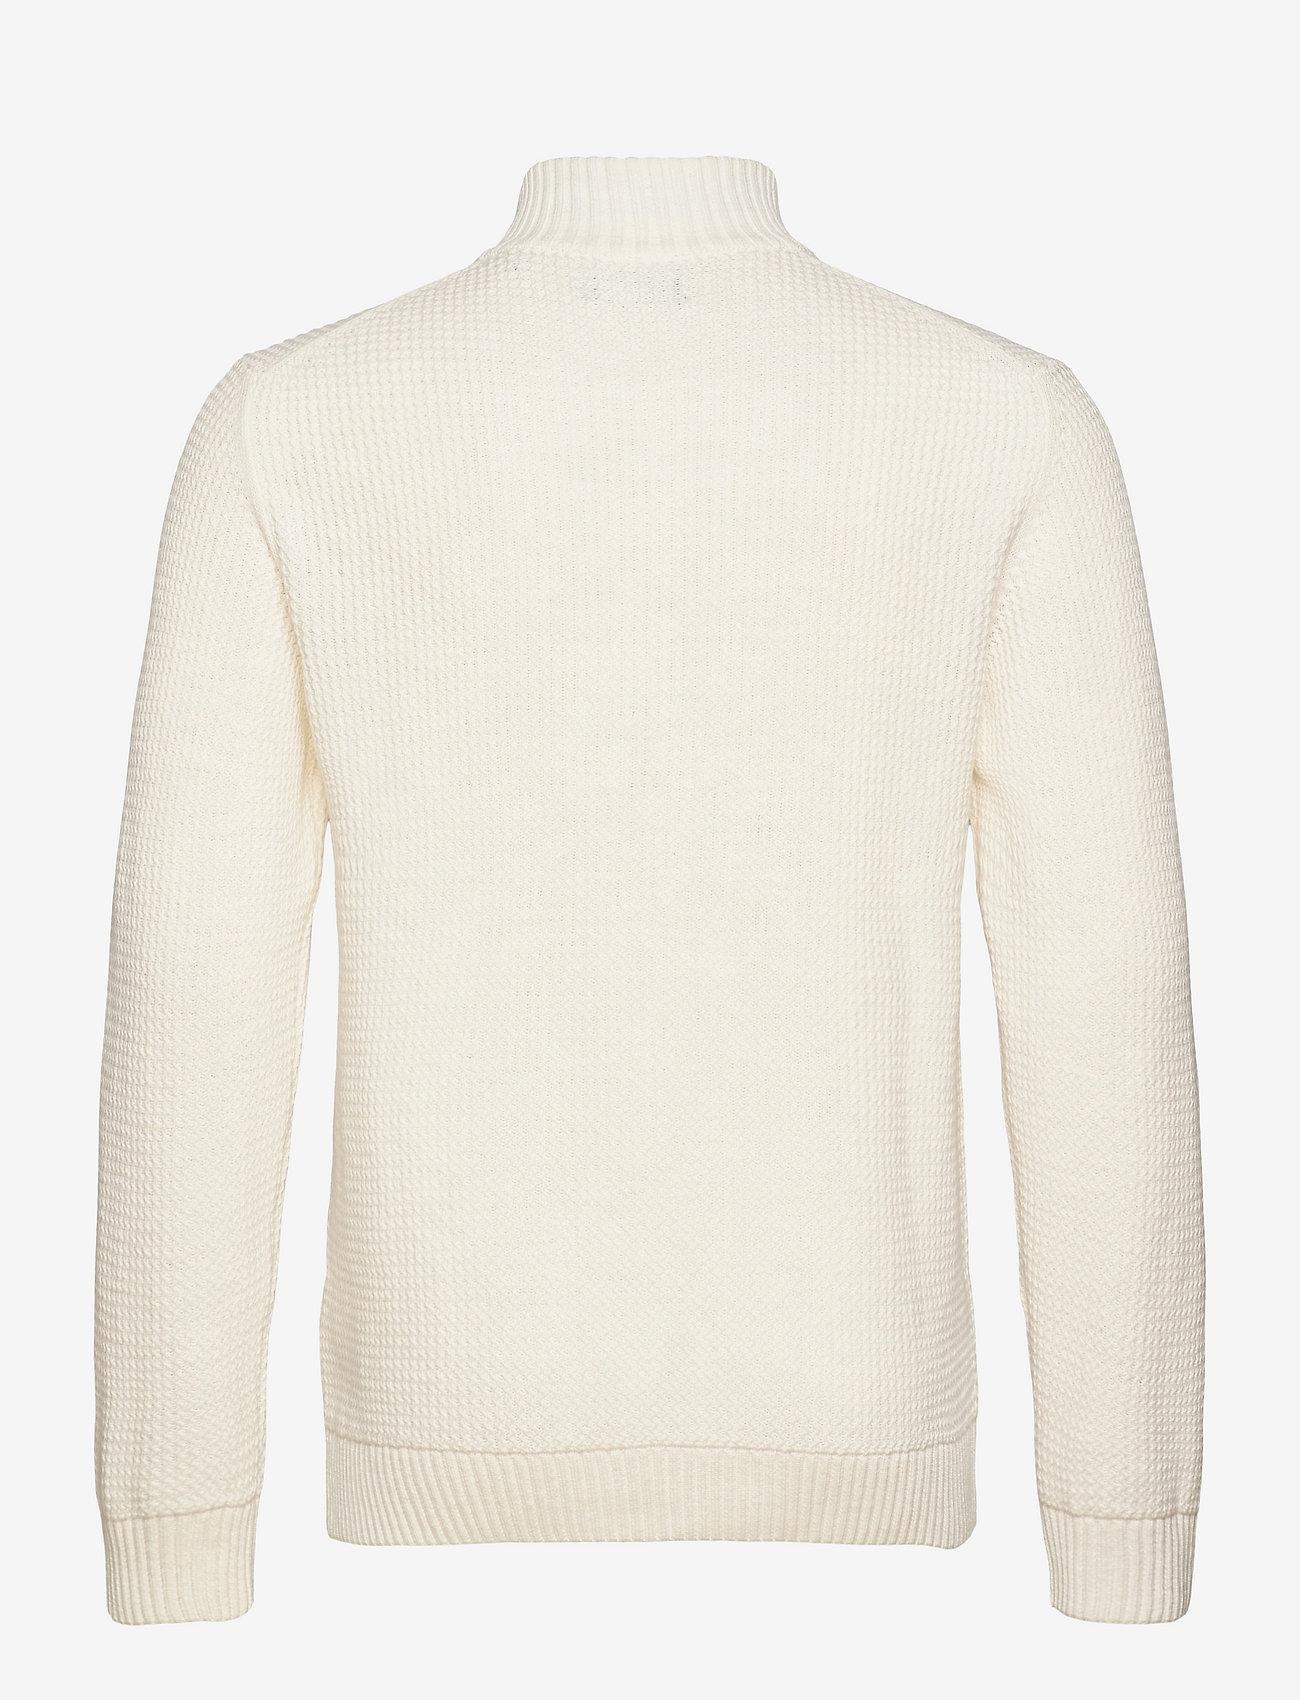 GANT - D2. COTTON STRUCTURE FULL ZIP - basic knitwear - eggshell - 1